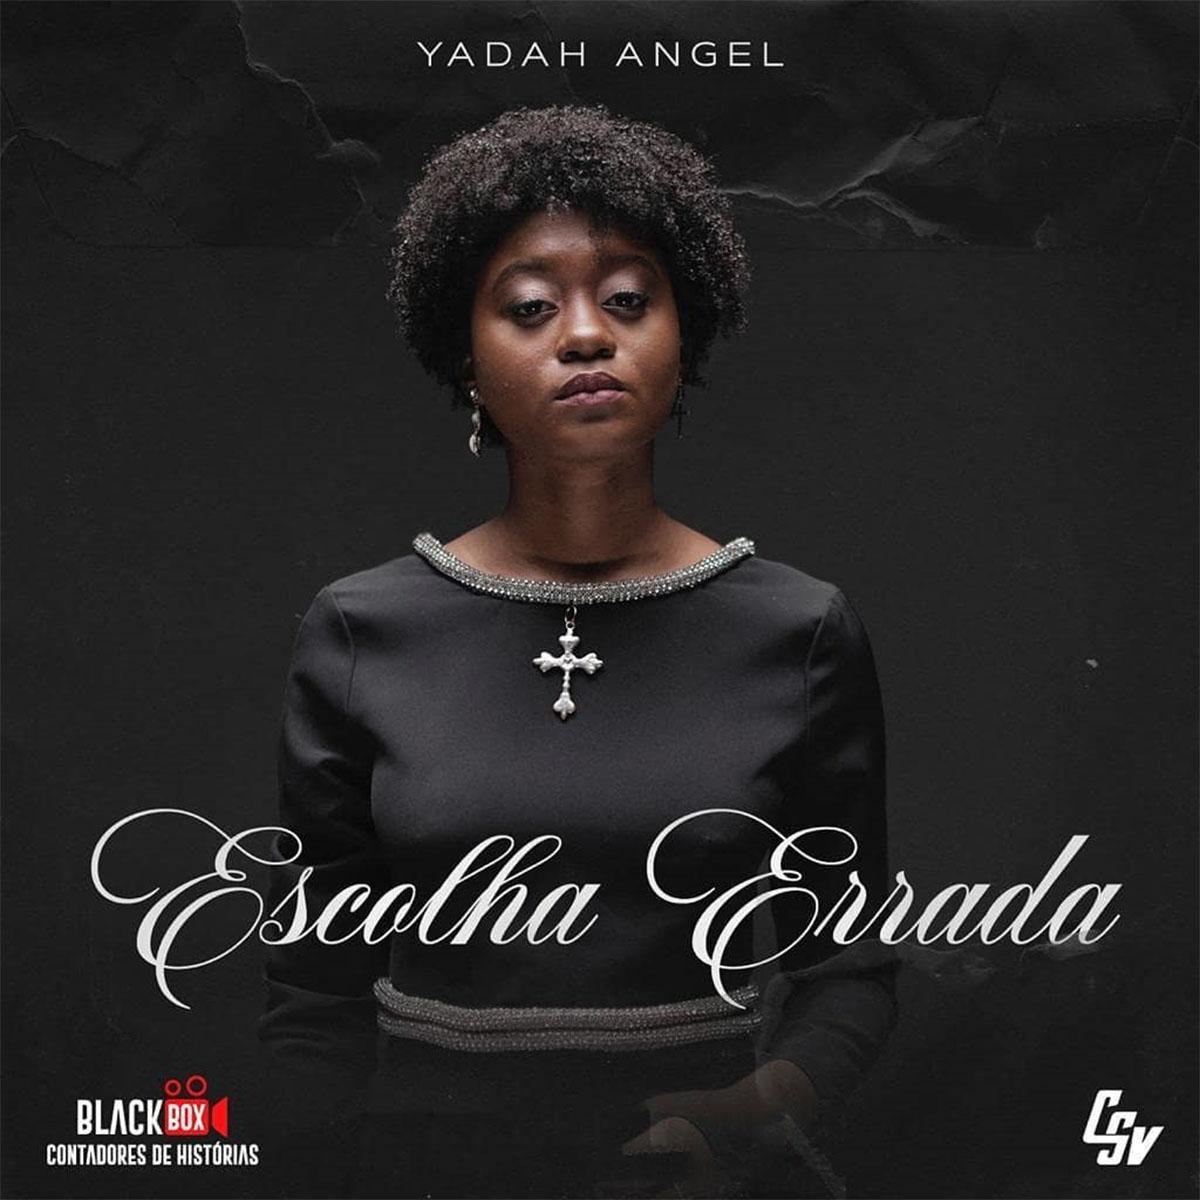 Yadah Angel - Escolha Errada